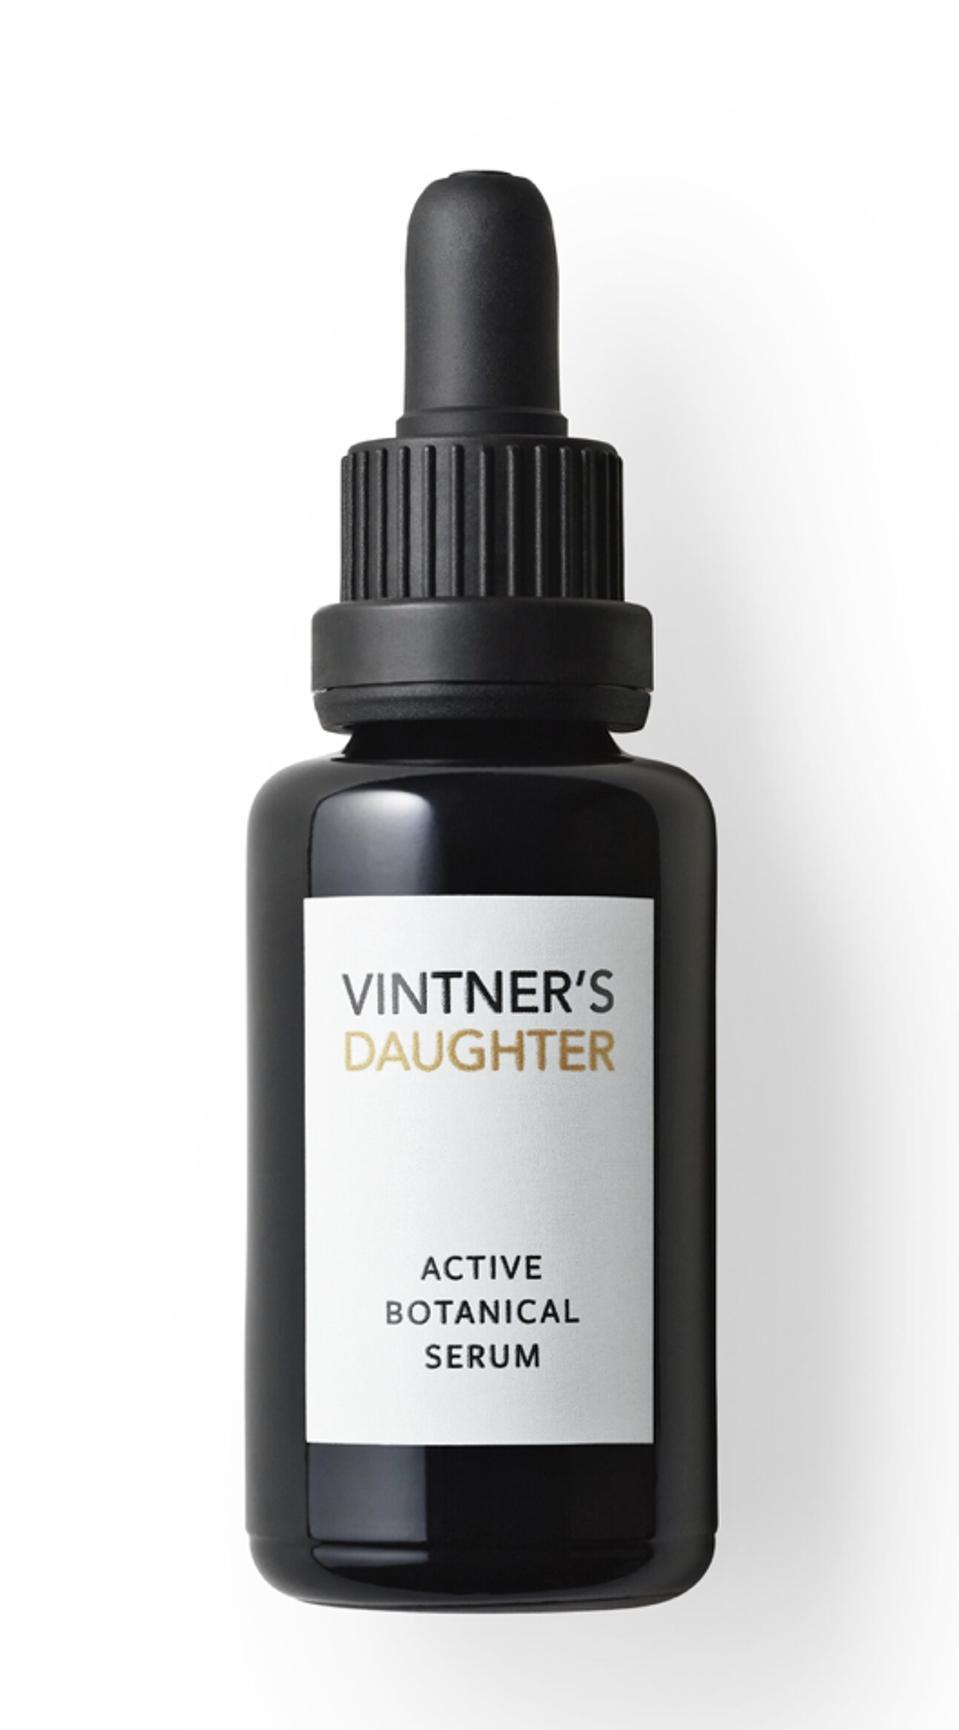 Vintner's Daughter Botanical Serum